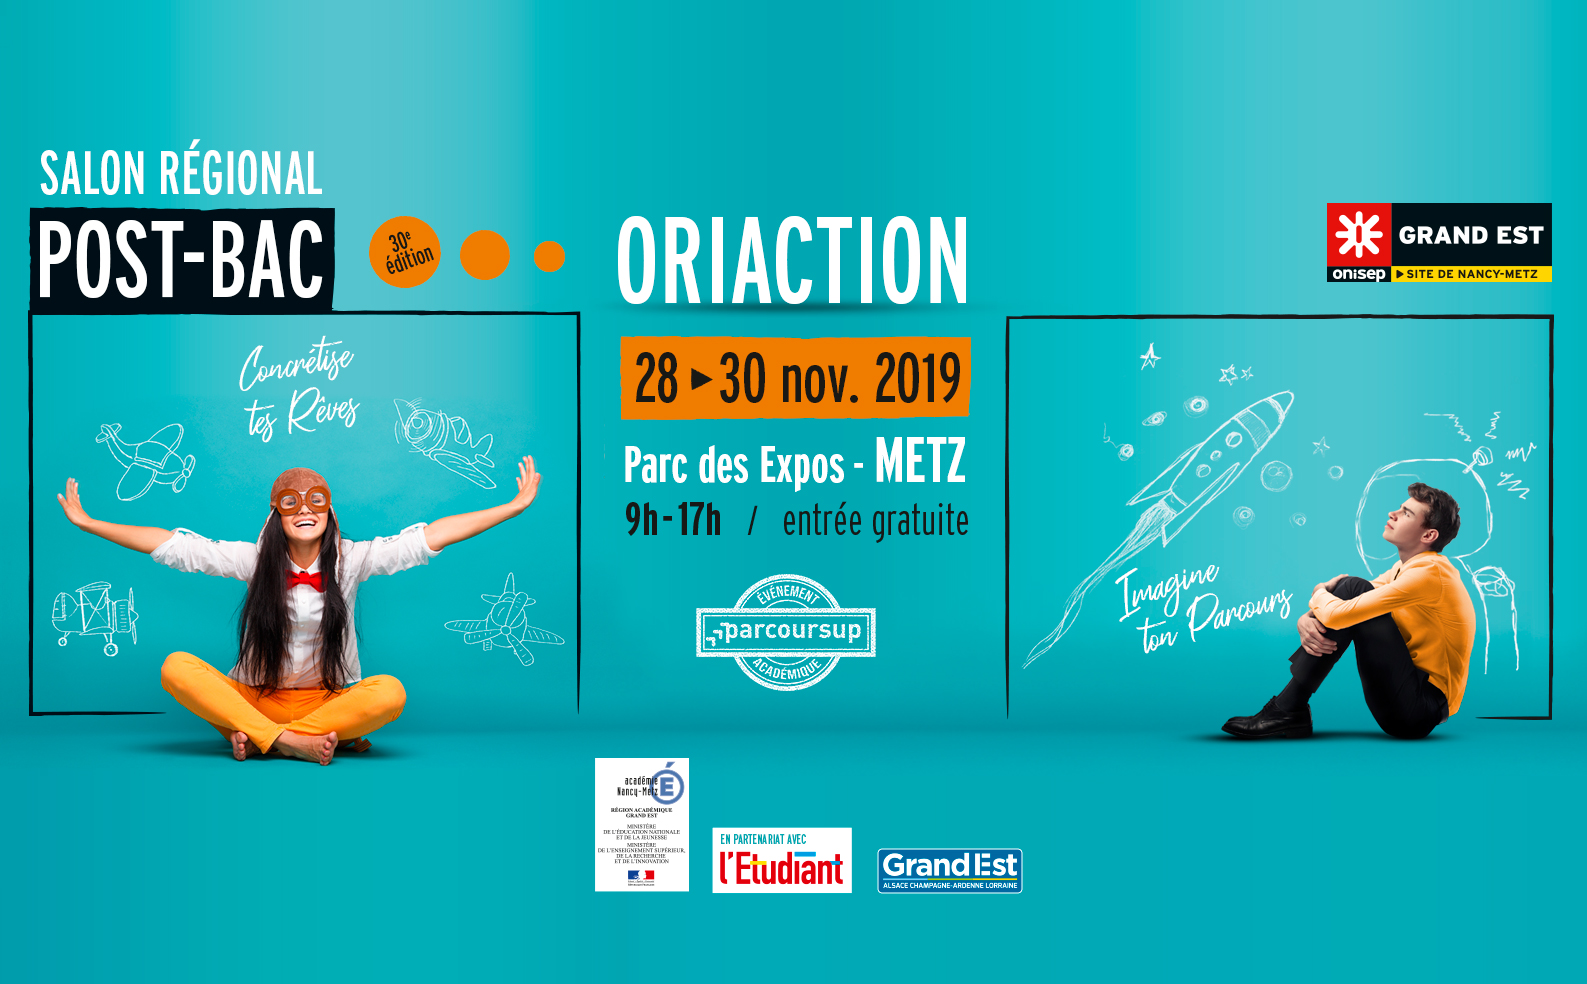 Oriaction 2019